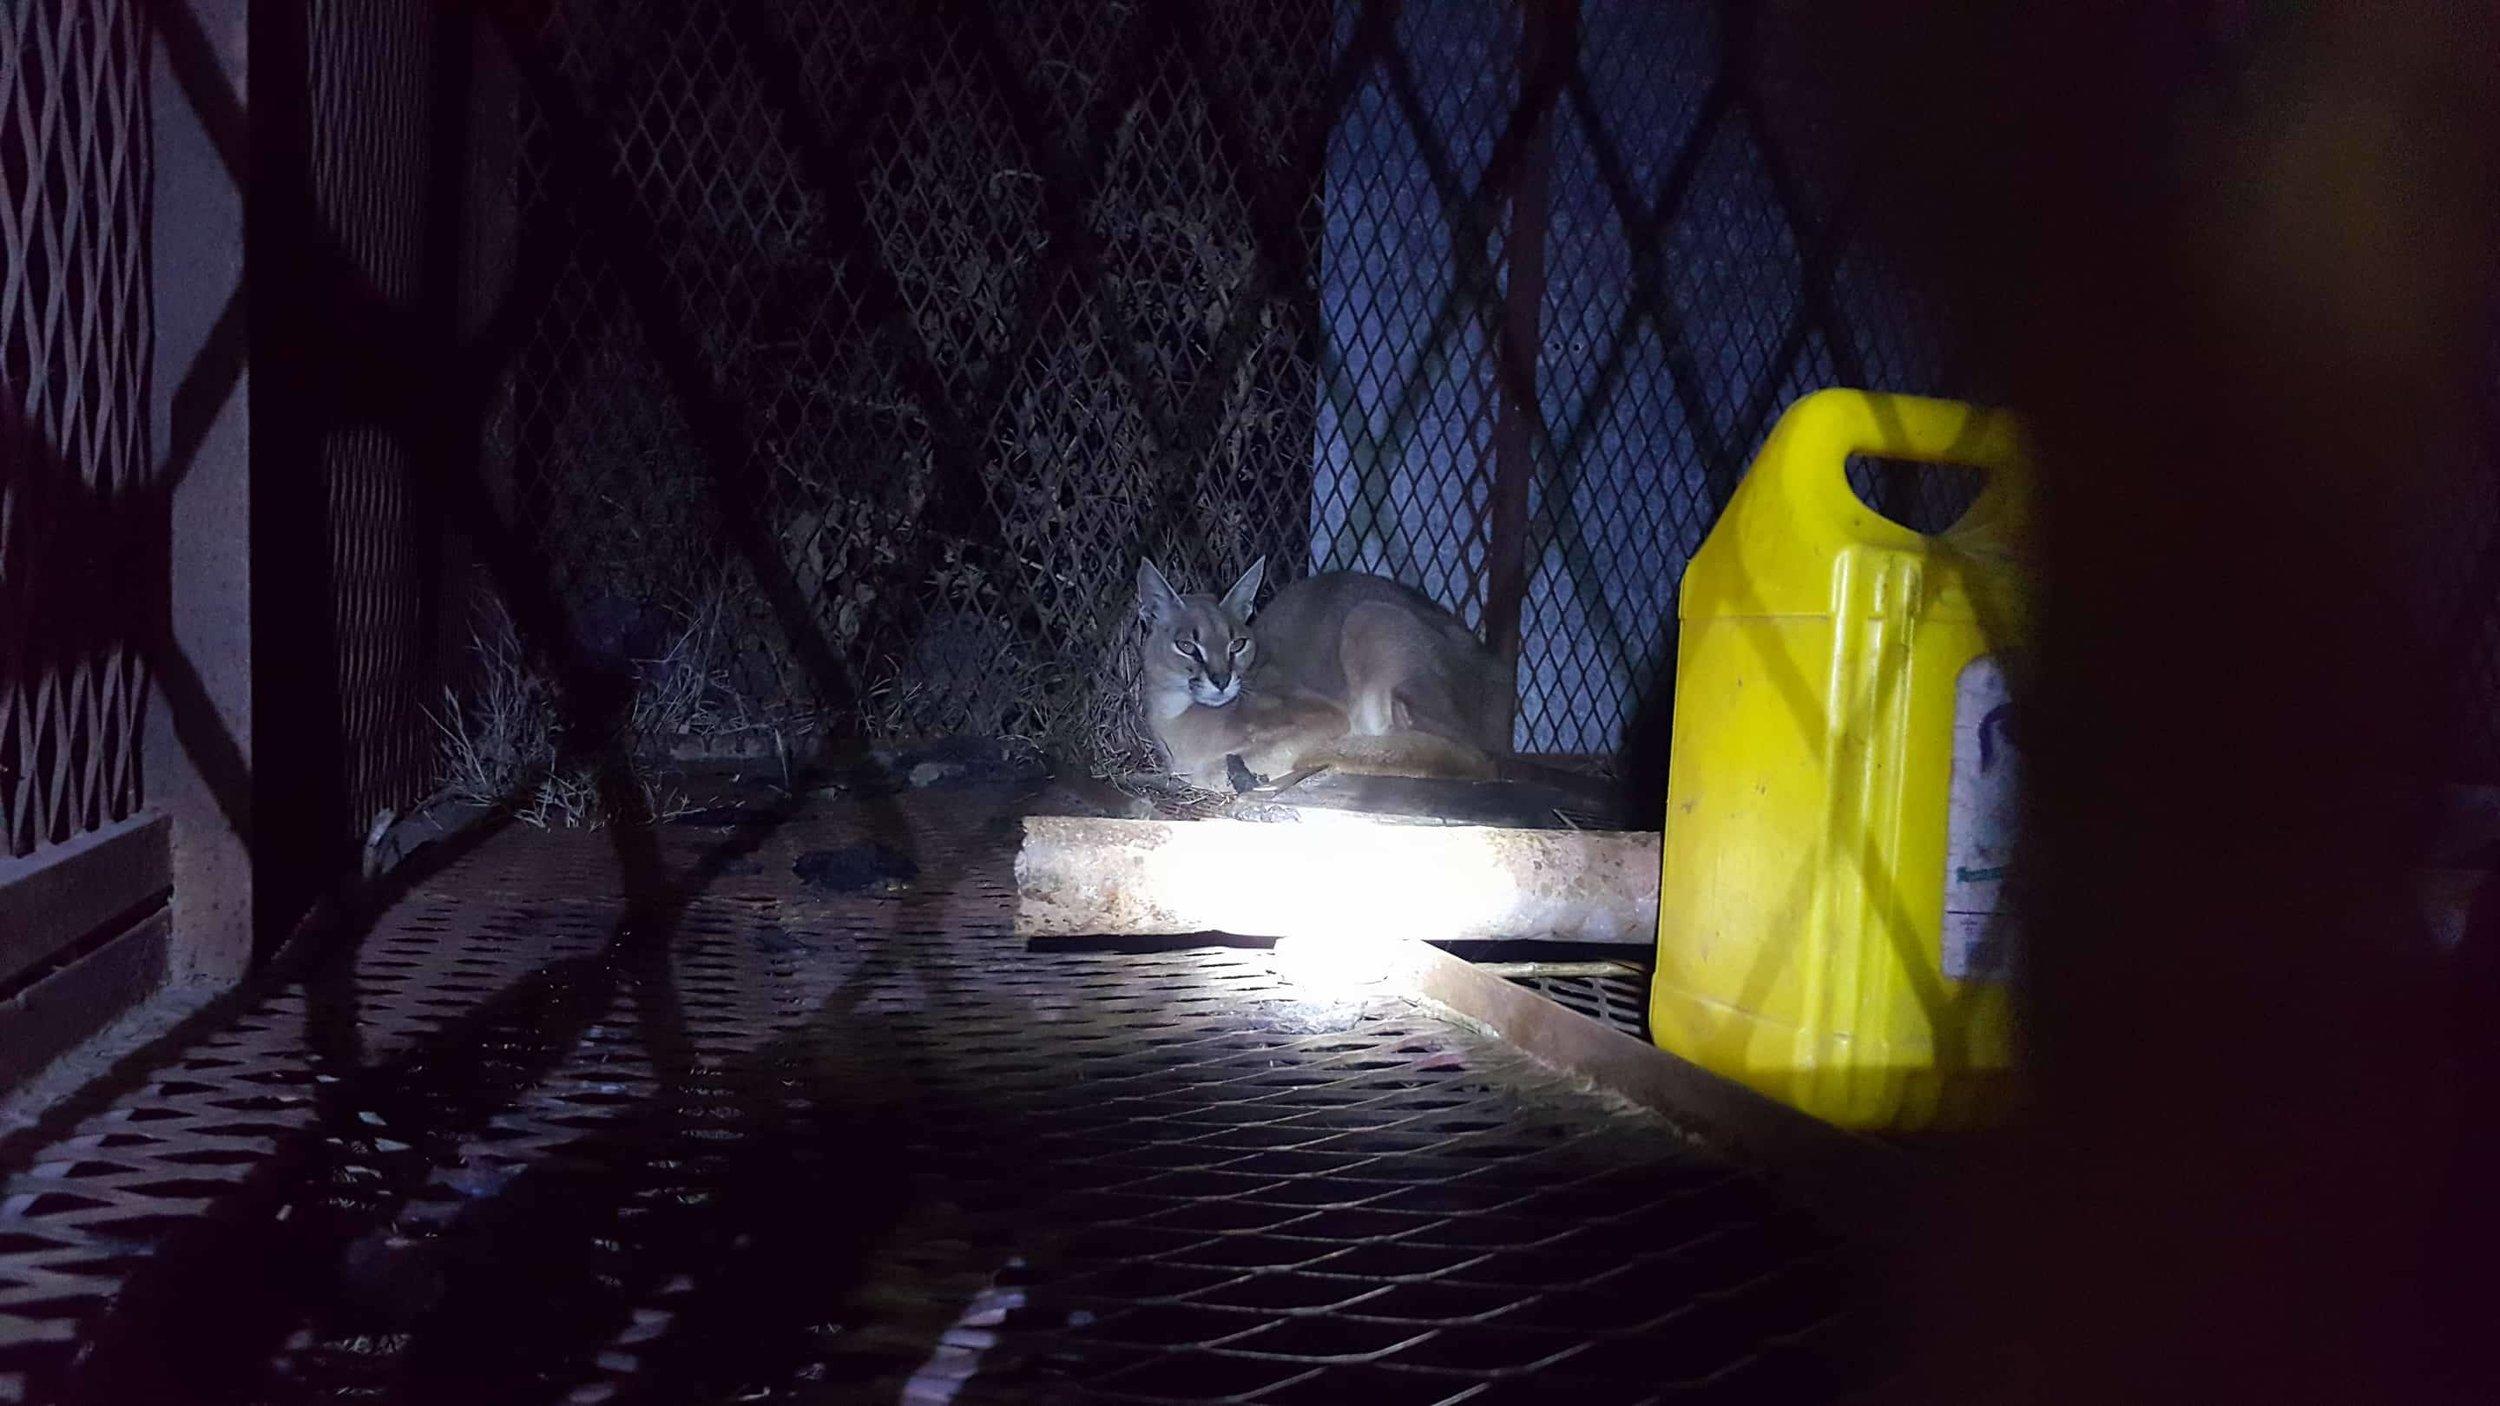 Ibb Zoo Yemen night feed Arabian Caracal OWAPAR 20 dec 2017 .jpg